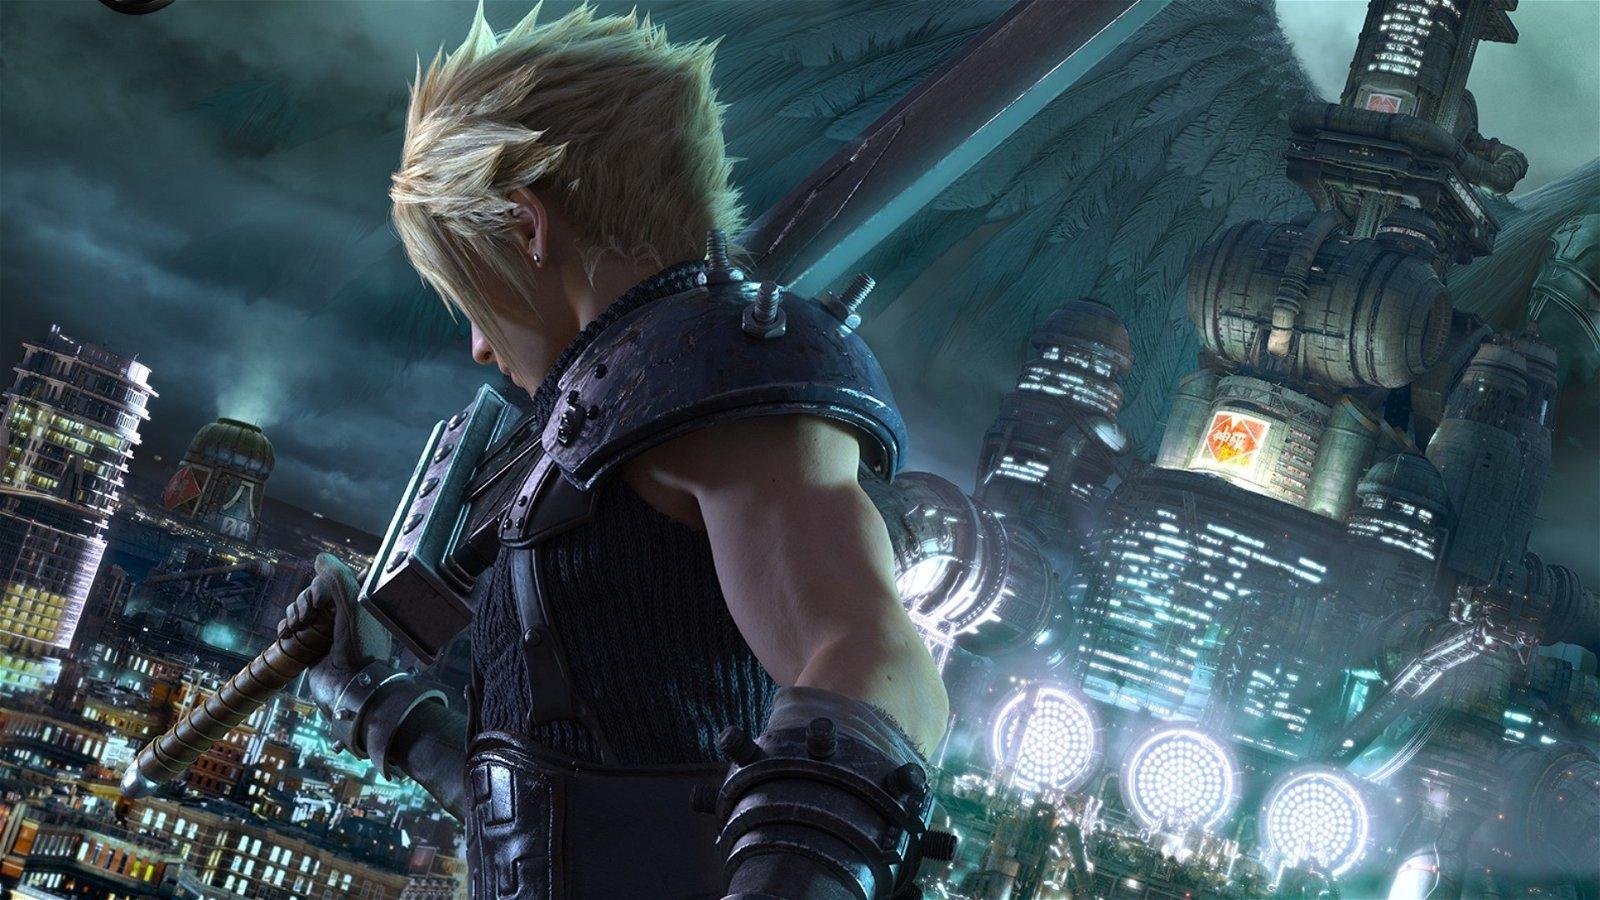 E3 Award Winners Revealed, Final Fantasy VII Wins Best of Show 1